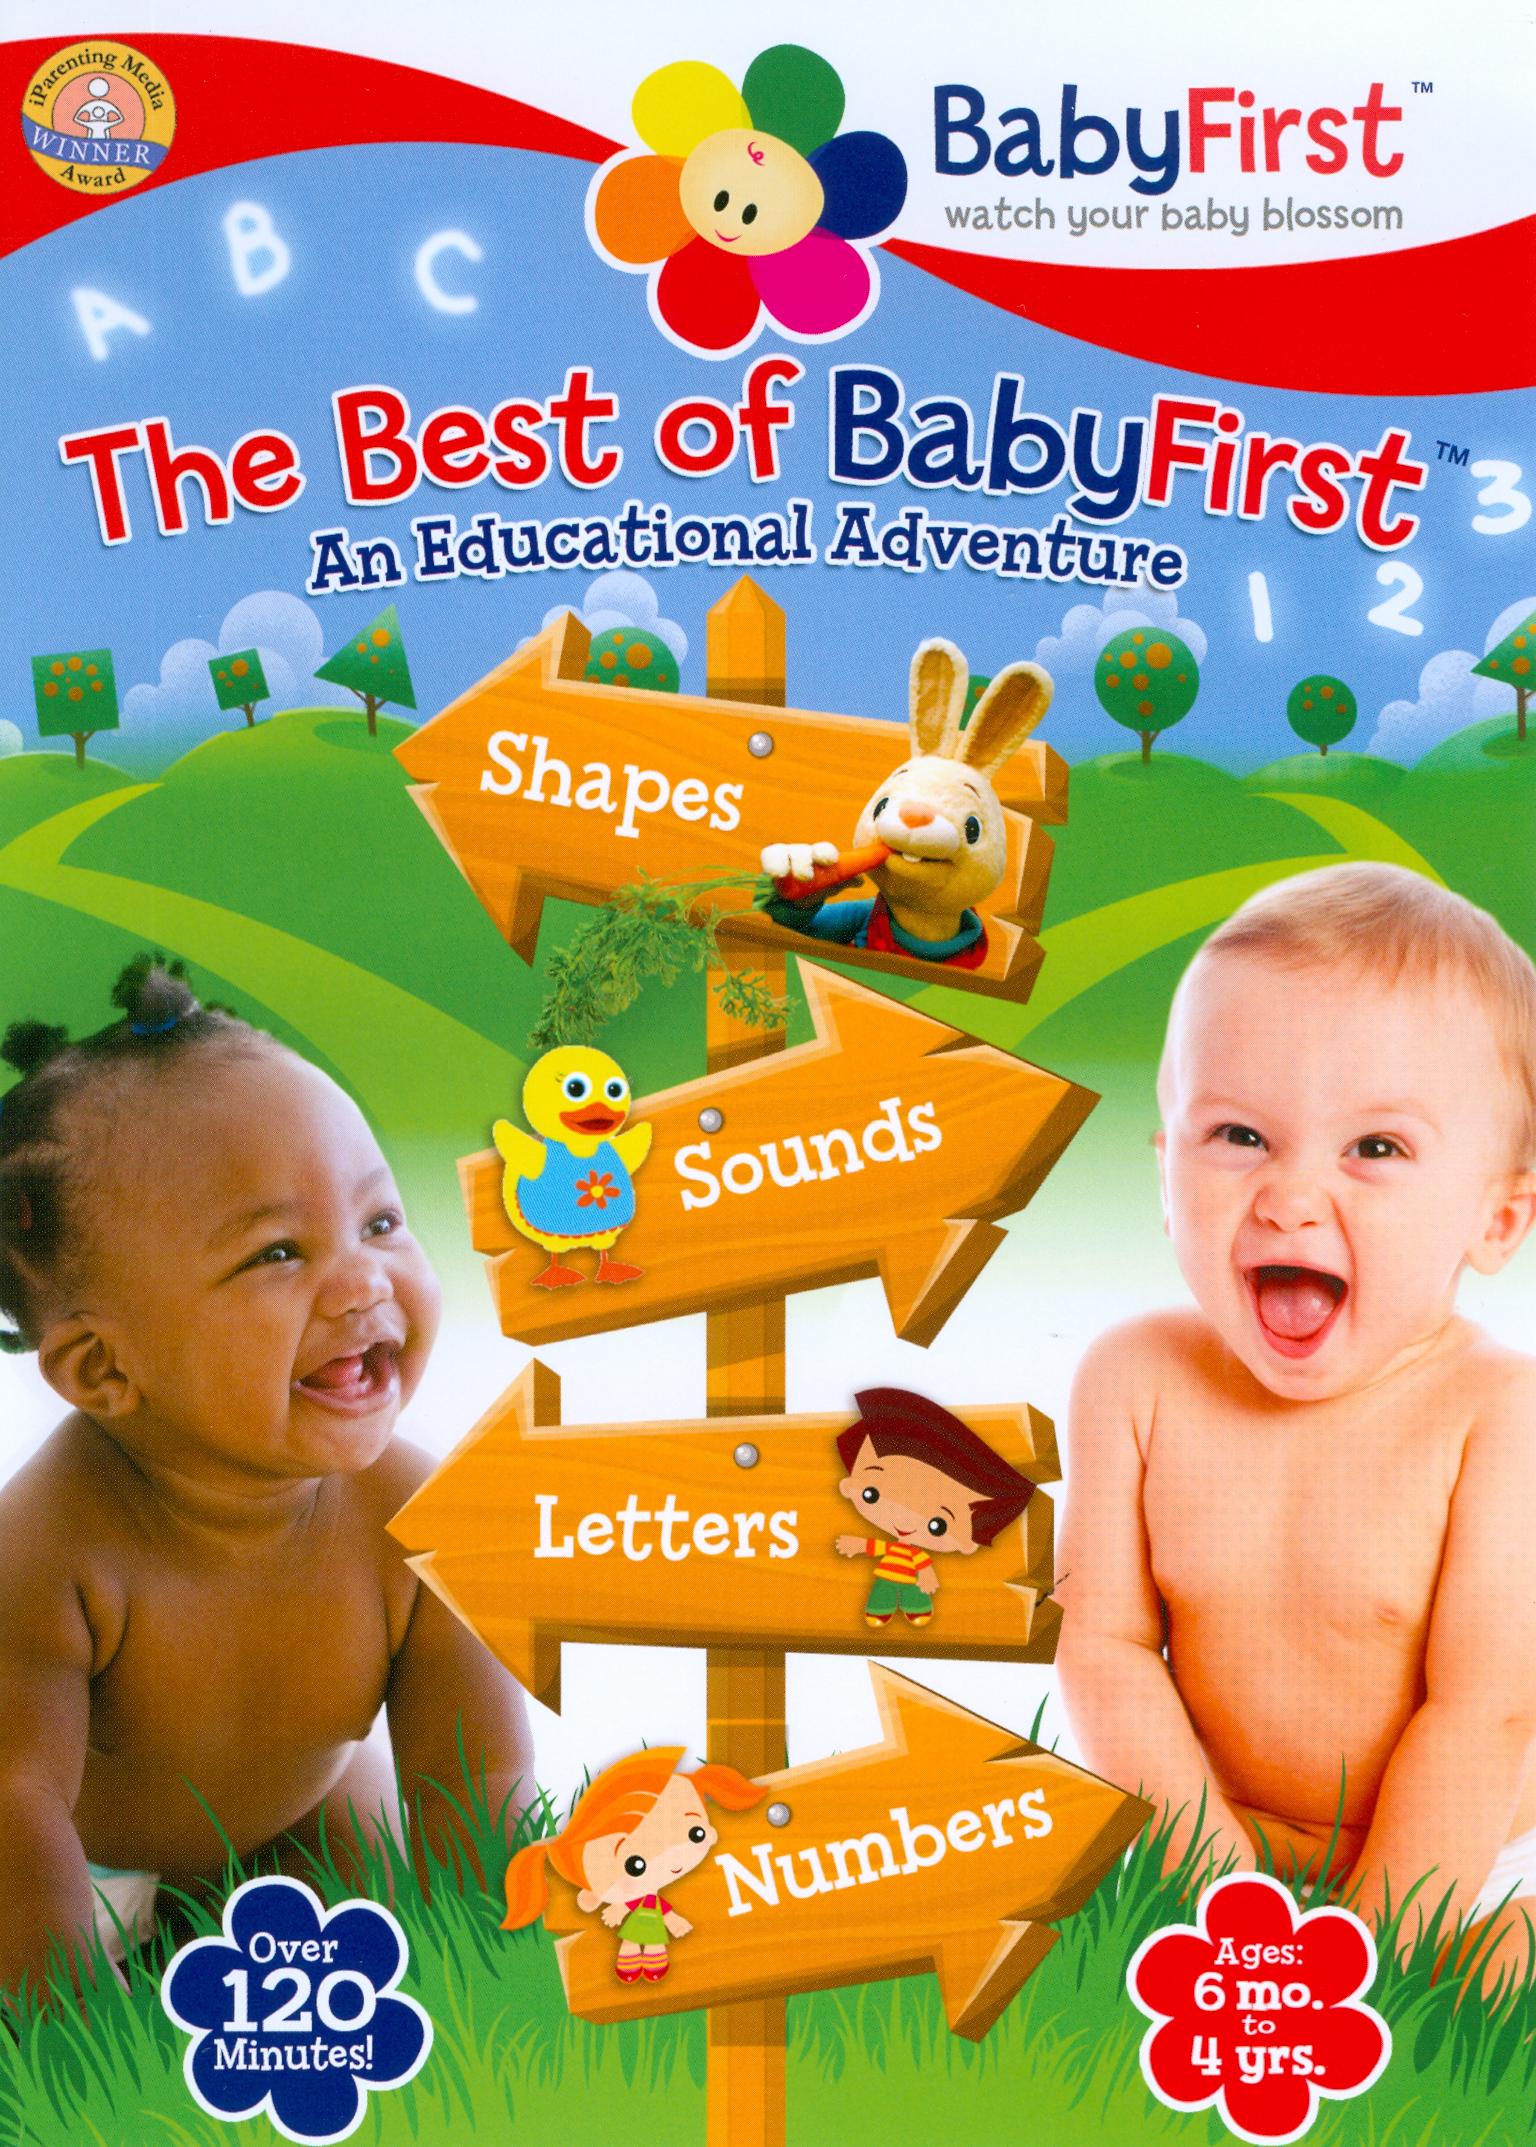 BabyFirst: The Best of BabyFirst - An Educational Adventure